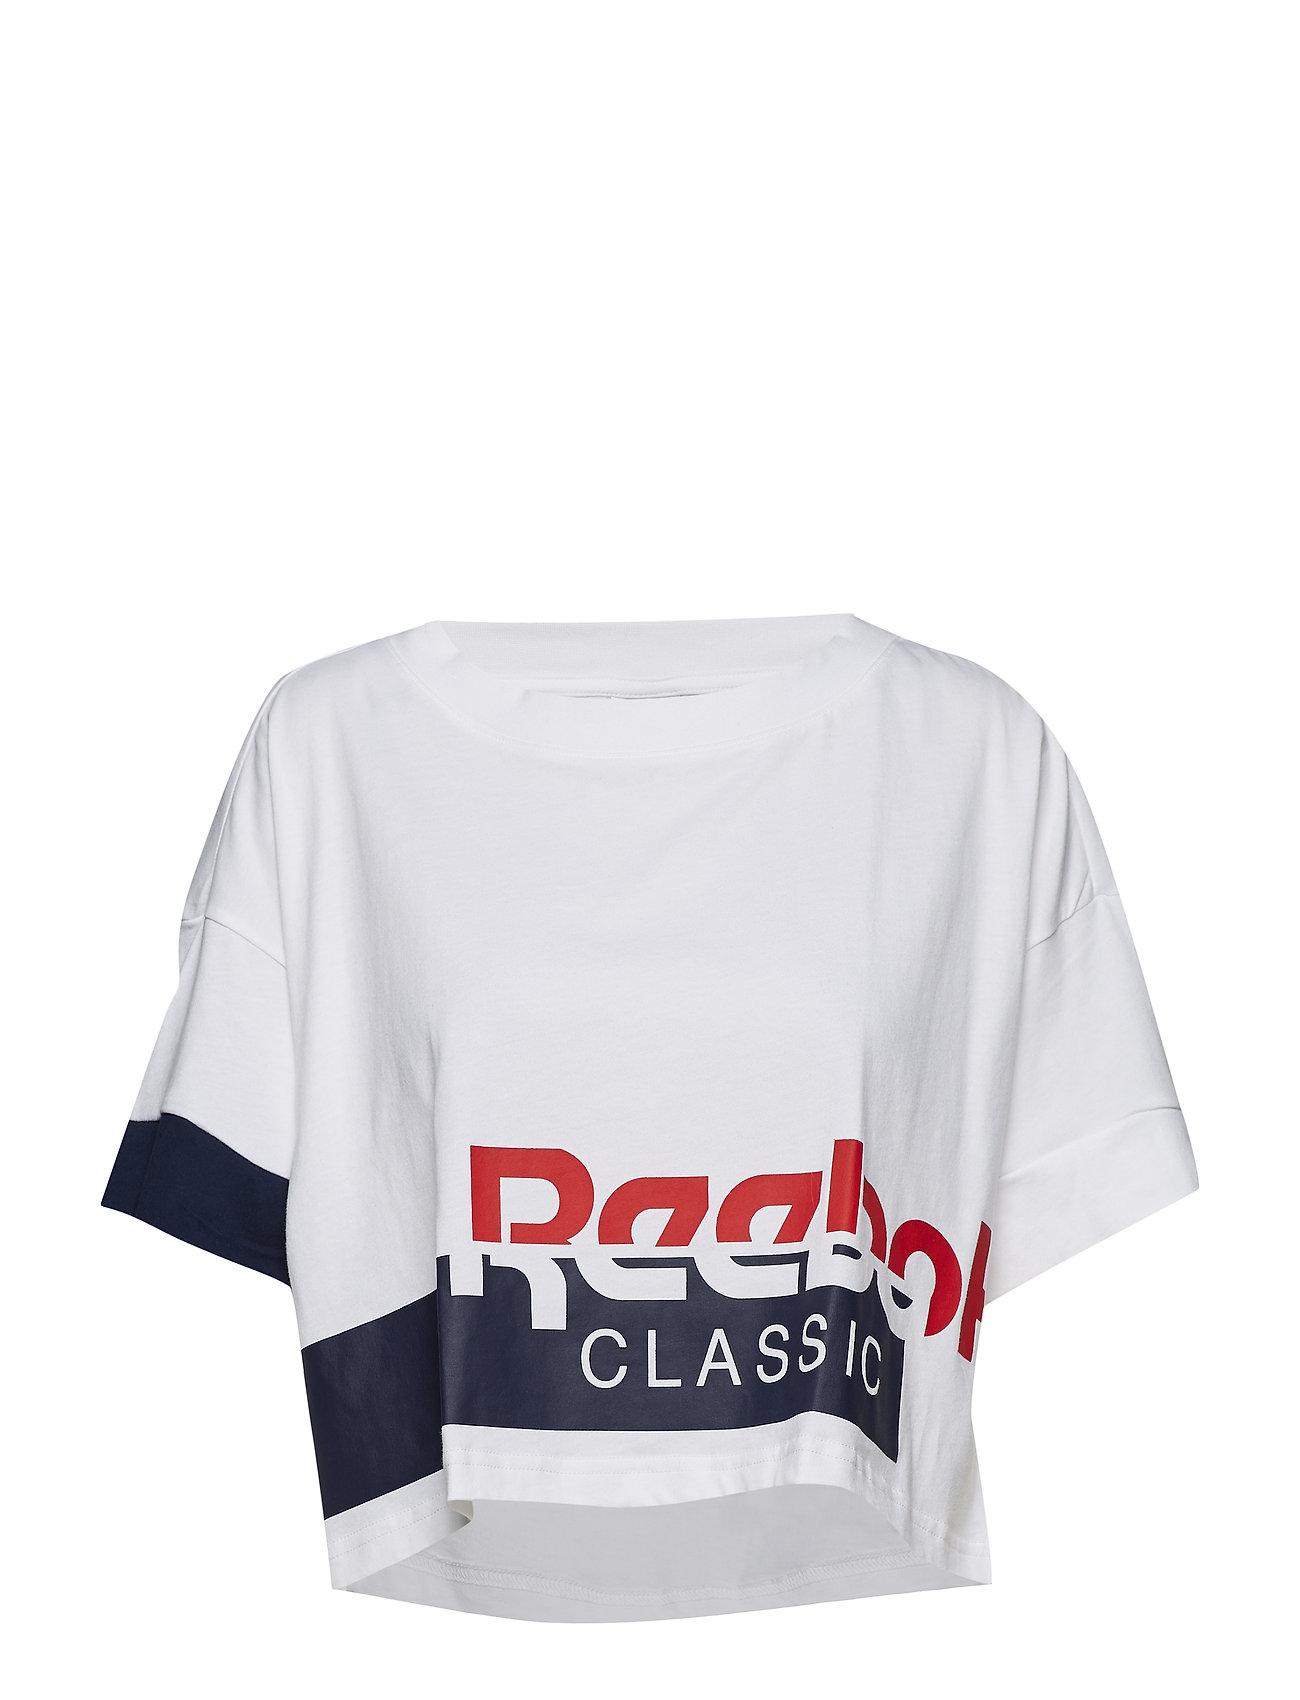 61229938560208 Ac Cropped Tee (White conavy) (209.30 kr) - Reebok Classics - T ...